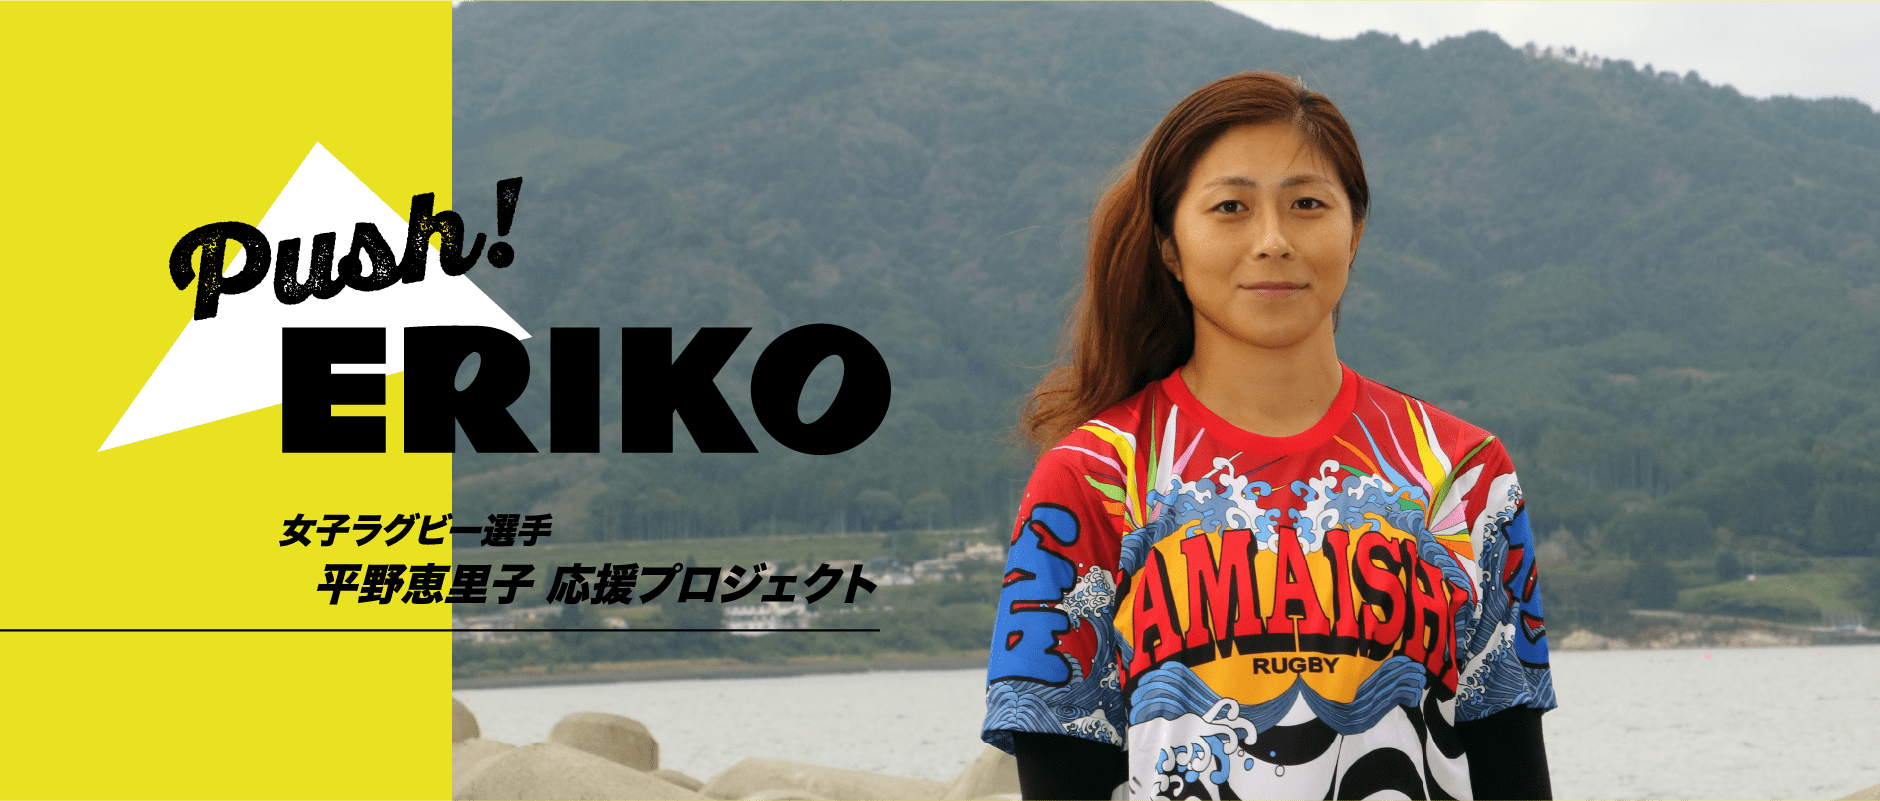 Push! ERIKO 女子ラグビー選手 平野恵理子 応援プロジェクト